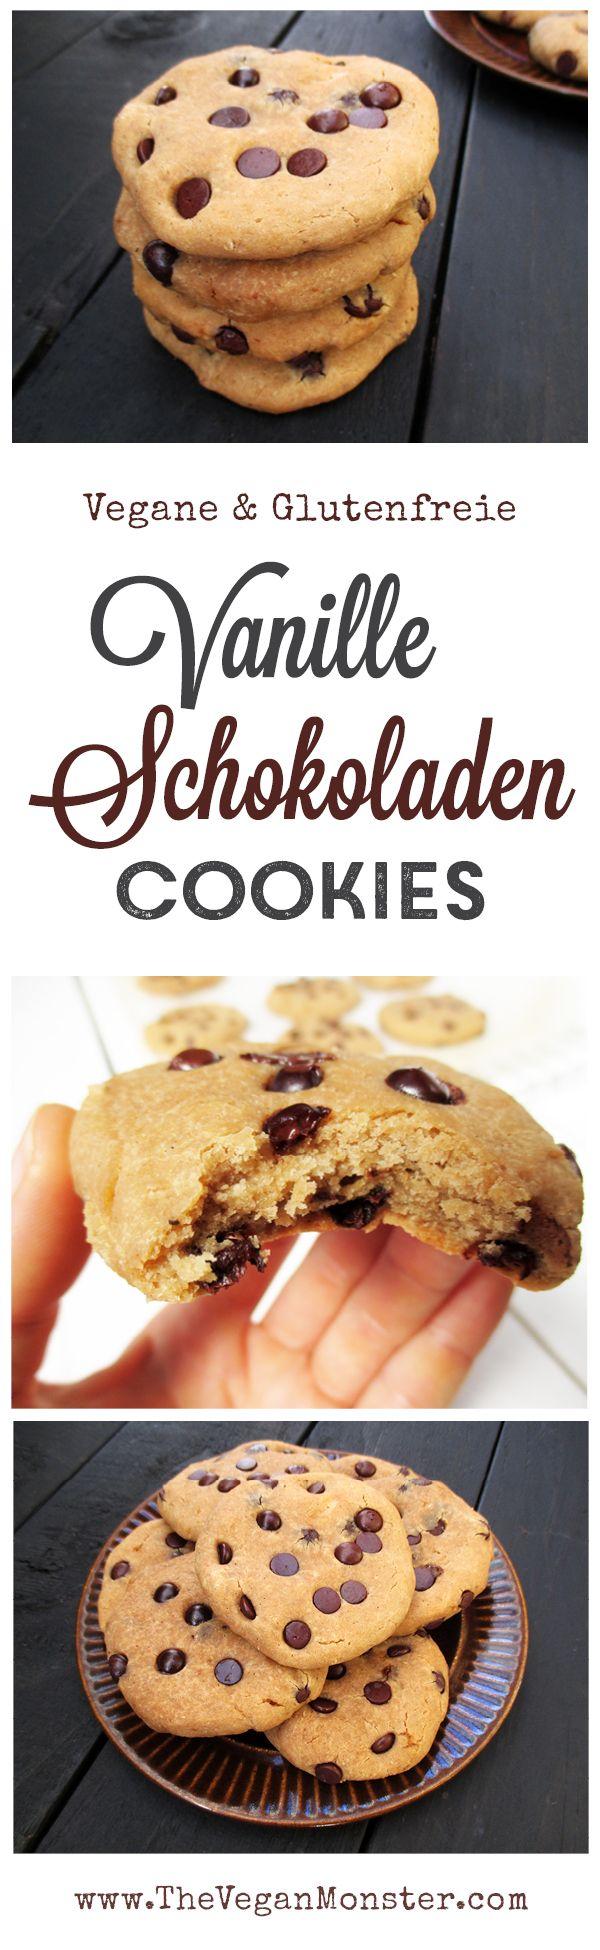 vegane glutenfreie vanille schokoladen cookies kekse rezept vegan pinterest schokolade. Black Bedroom Furniture Sets. Home Design Ideas